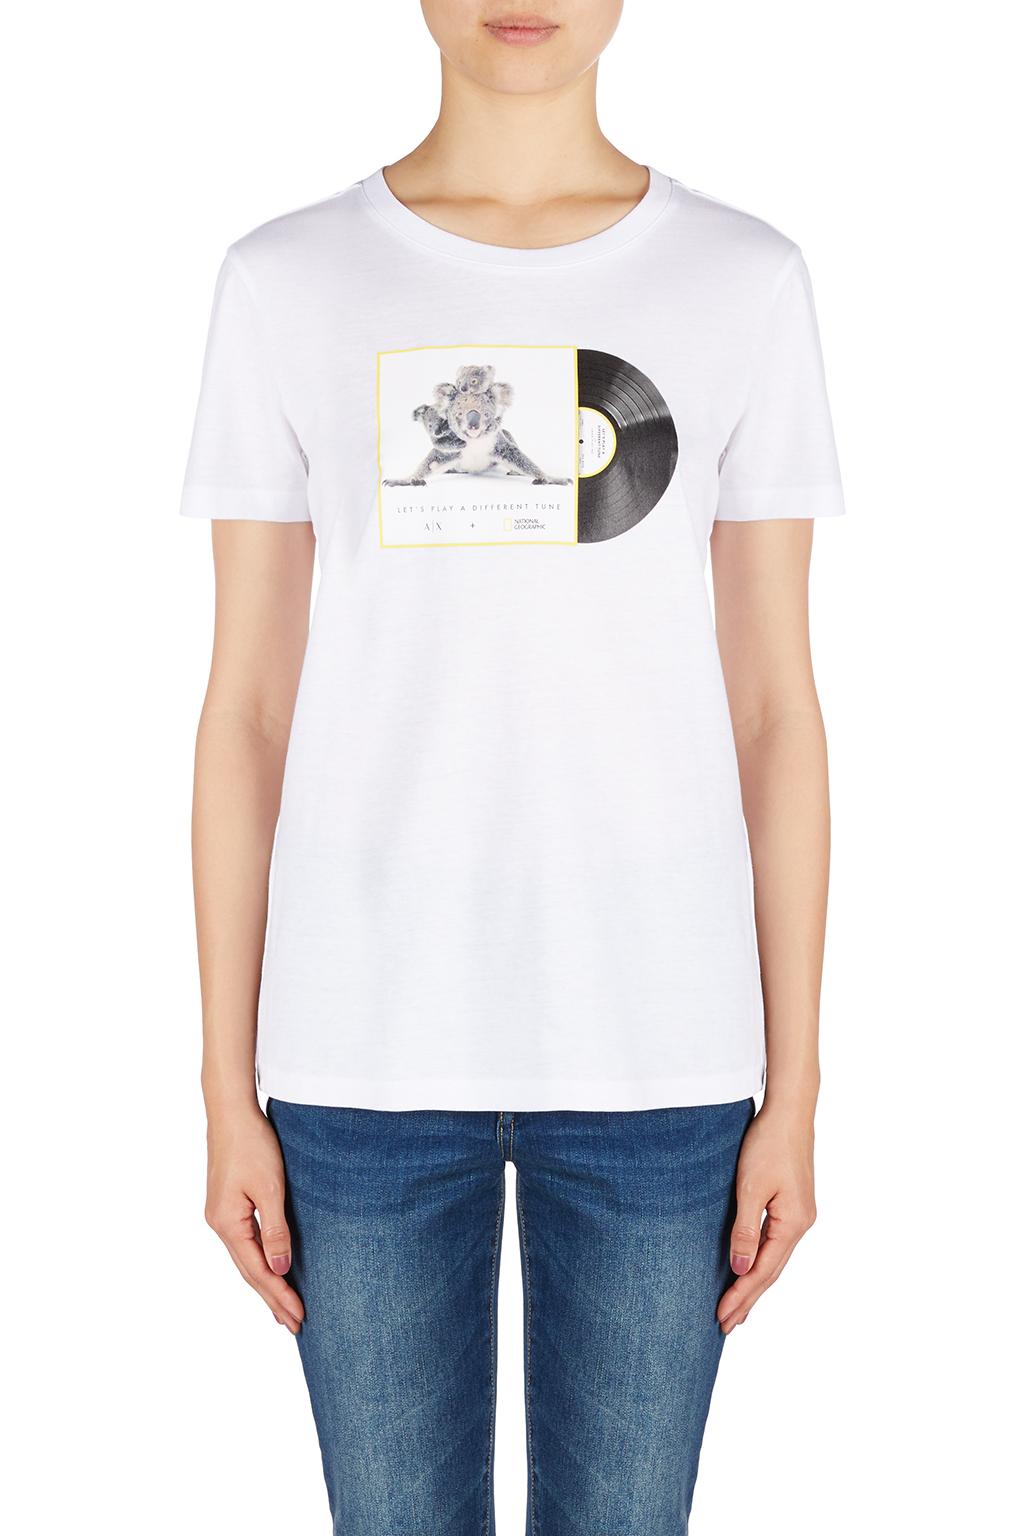 T-Shirt donna ARMANI EXCHANGE stampa koala